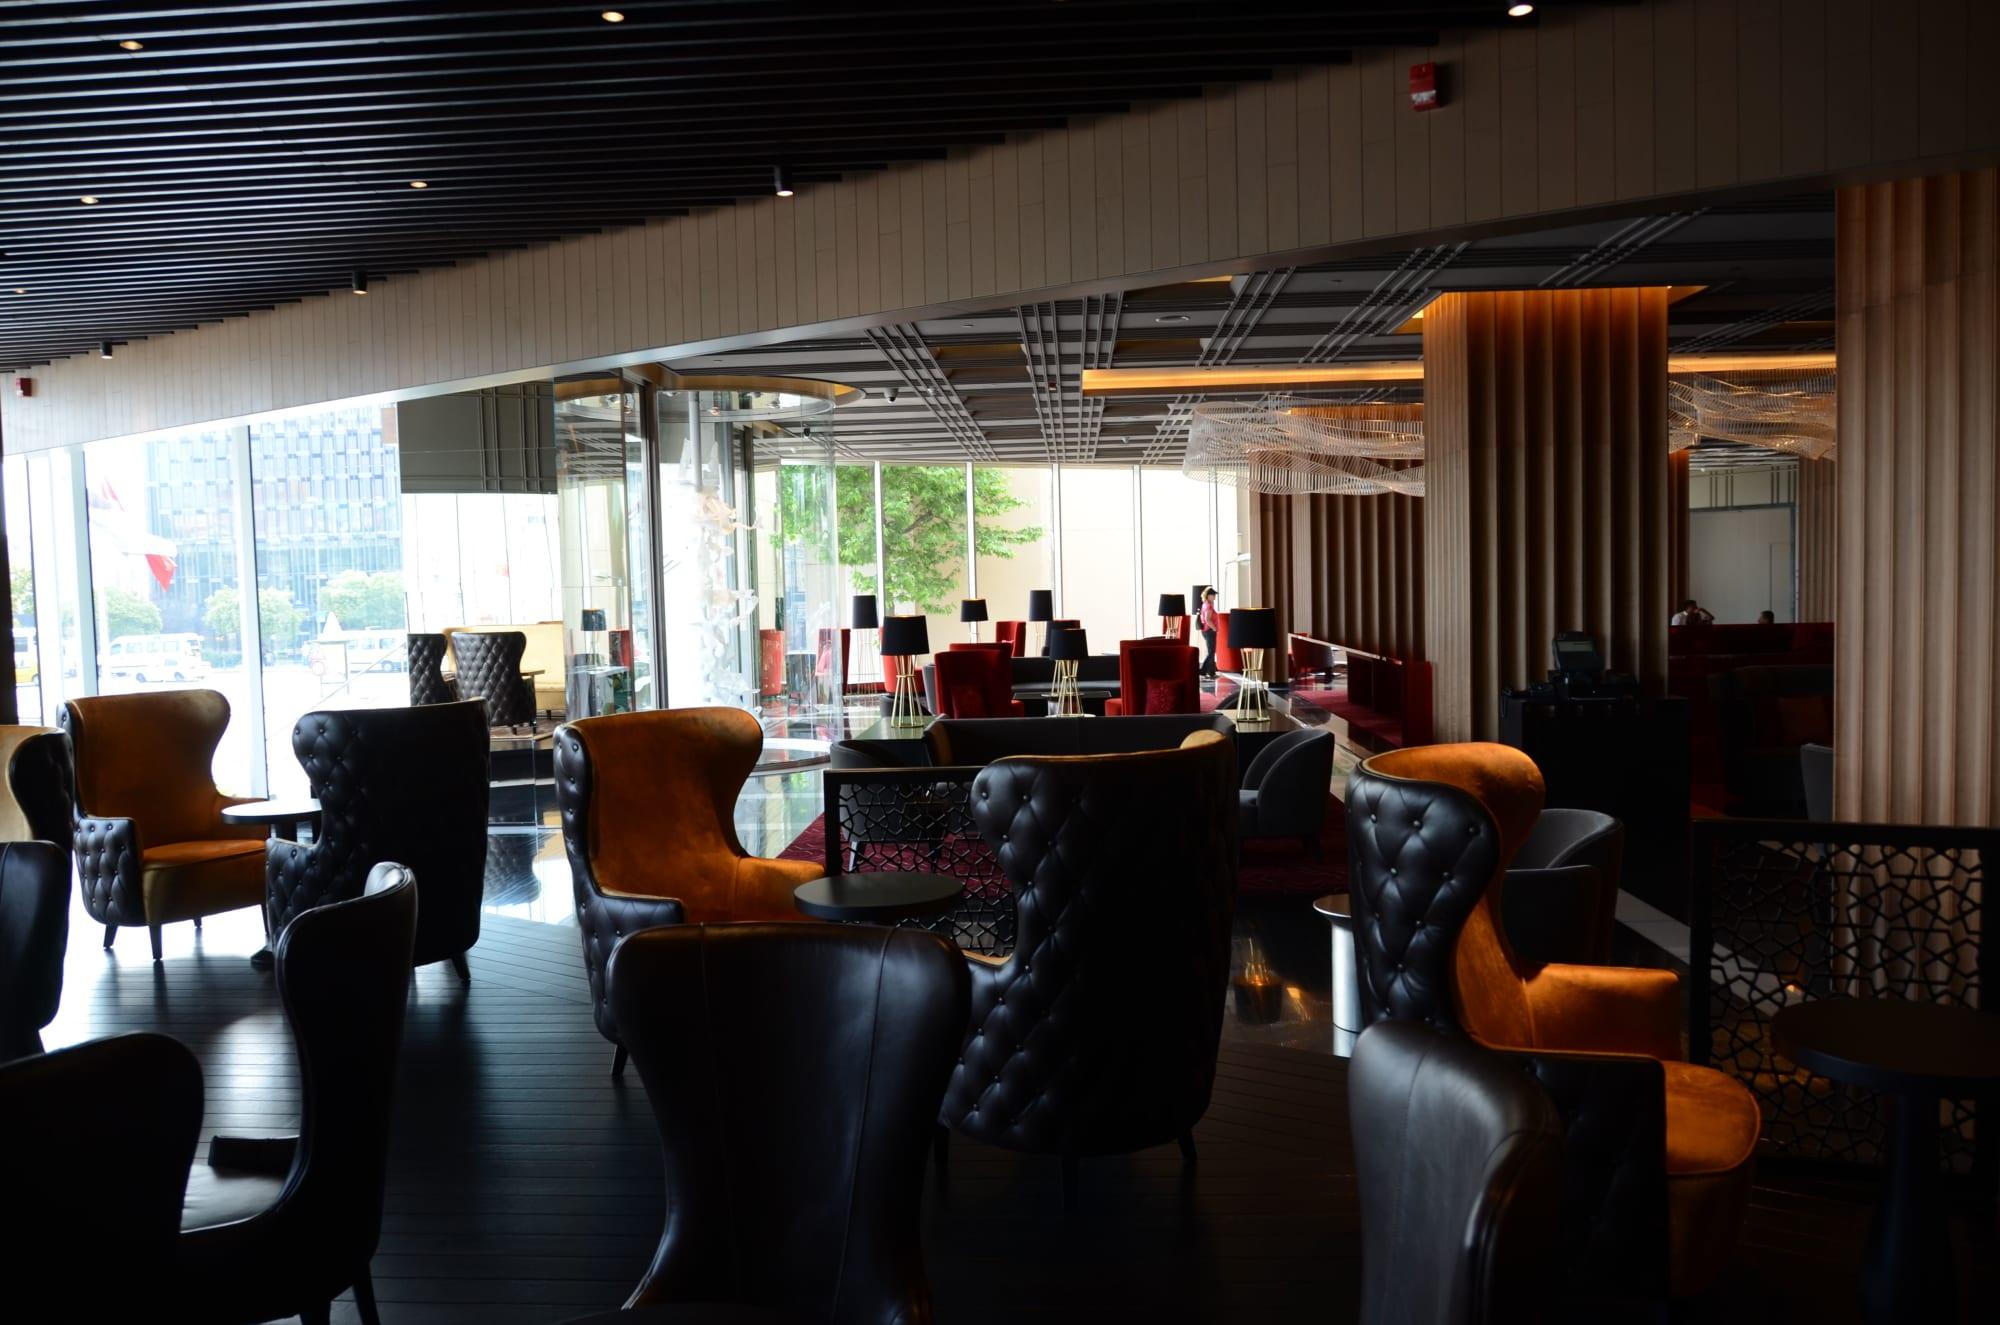 Architecture by Mobi seen at The Marmara Taksim - The Marmara Hotel